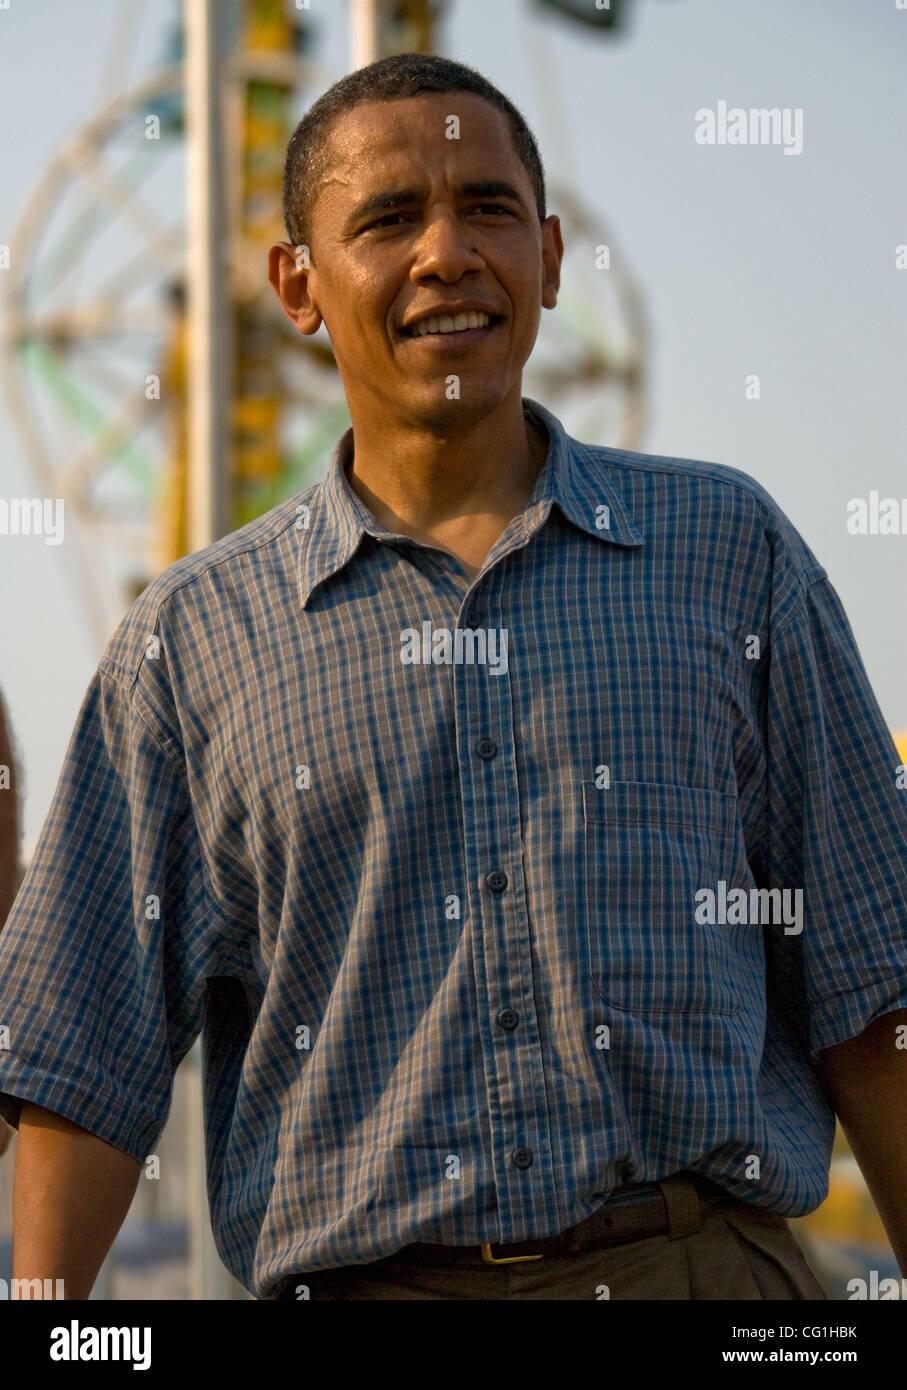 Aug 16, 2007 - Des Moines, IA, USA - Democratic presidential hopeful Senator BARACK OBAMA (D-Illinois) campaigns - Stock Image